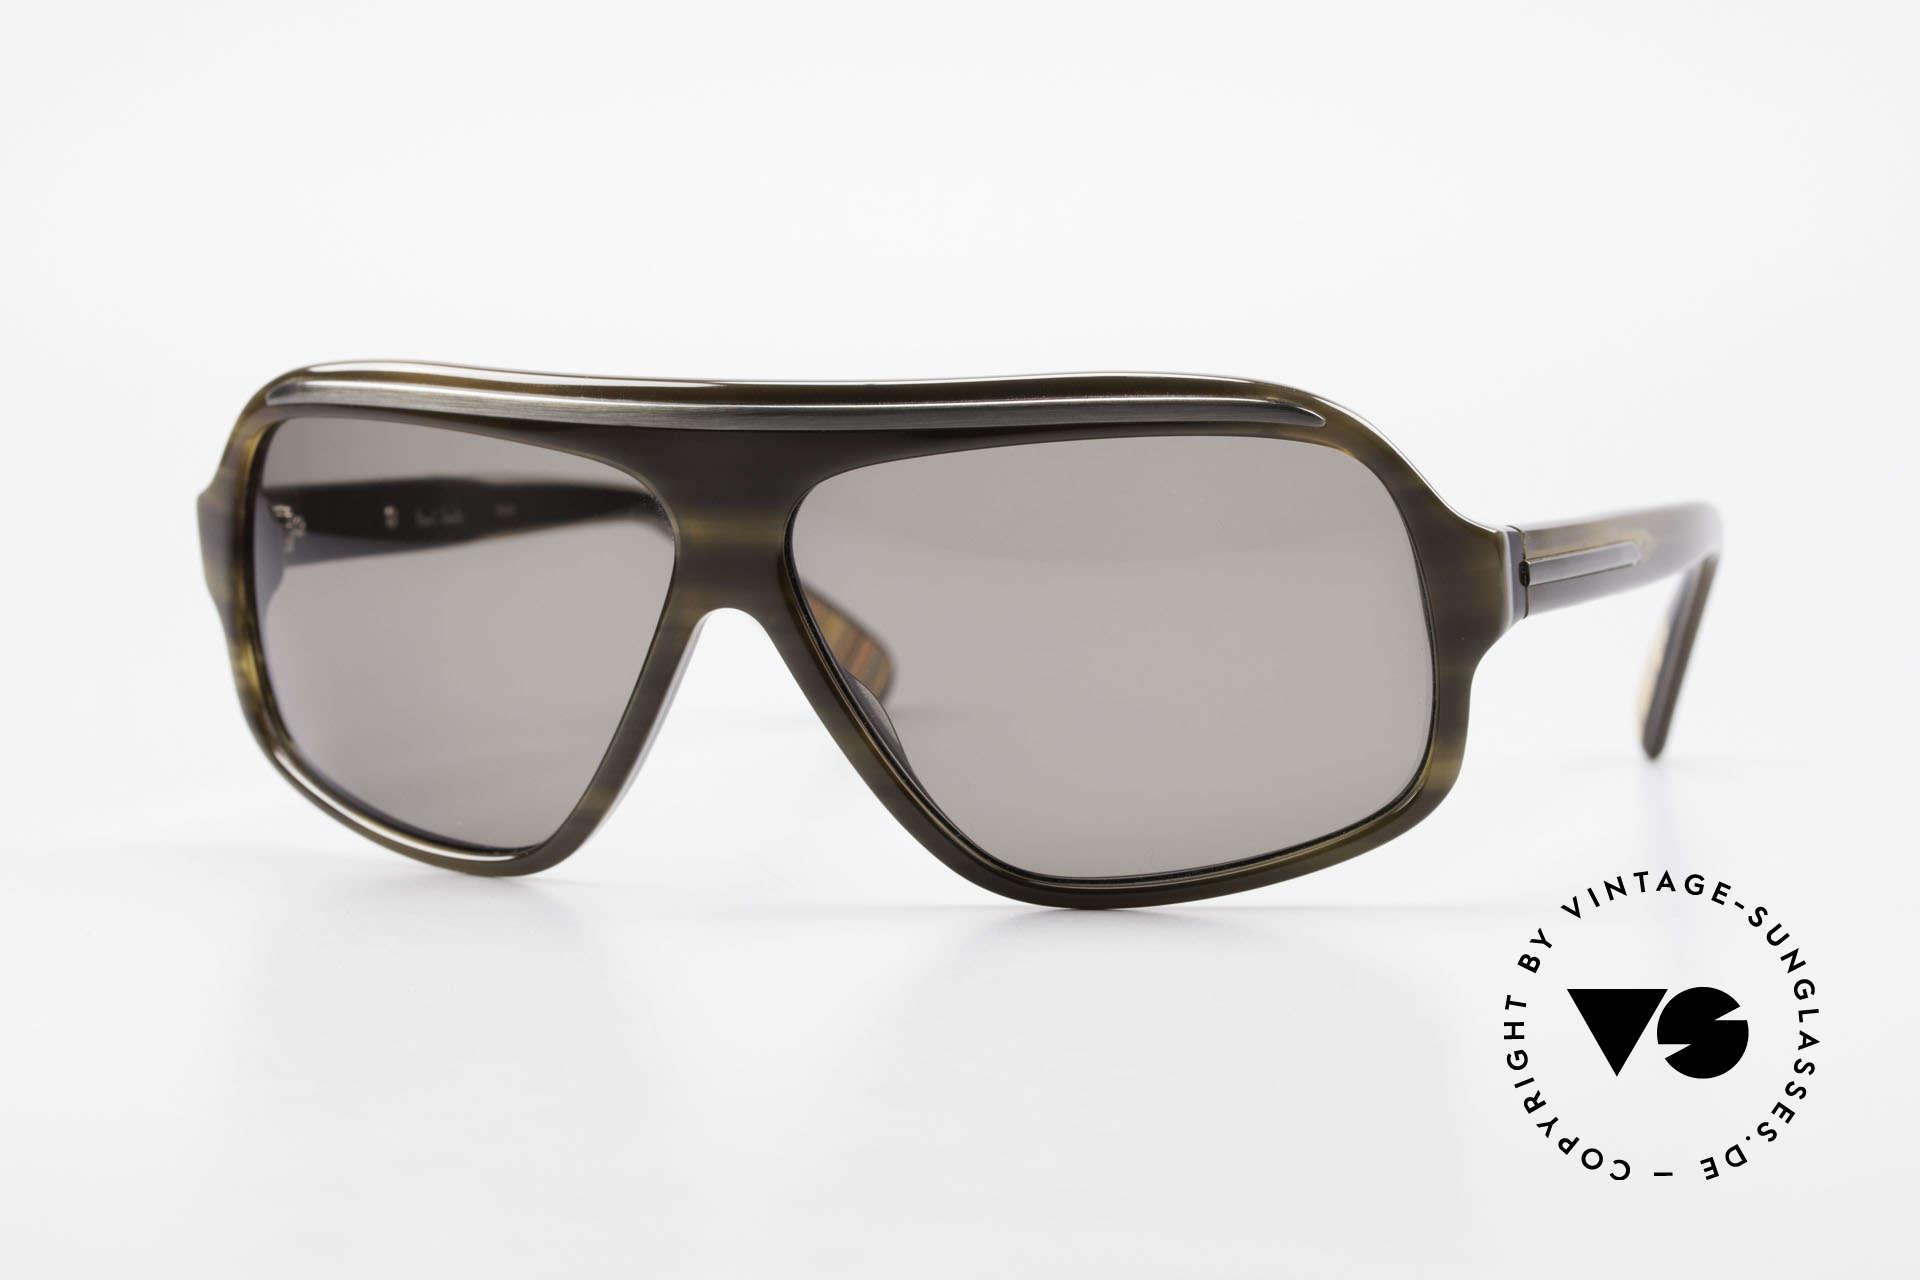 Paul Smith PS382 Vintage Men's Sunglasses 90's, old Paul Smith vintage sunglasses from the early 1990's, Made for Men